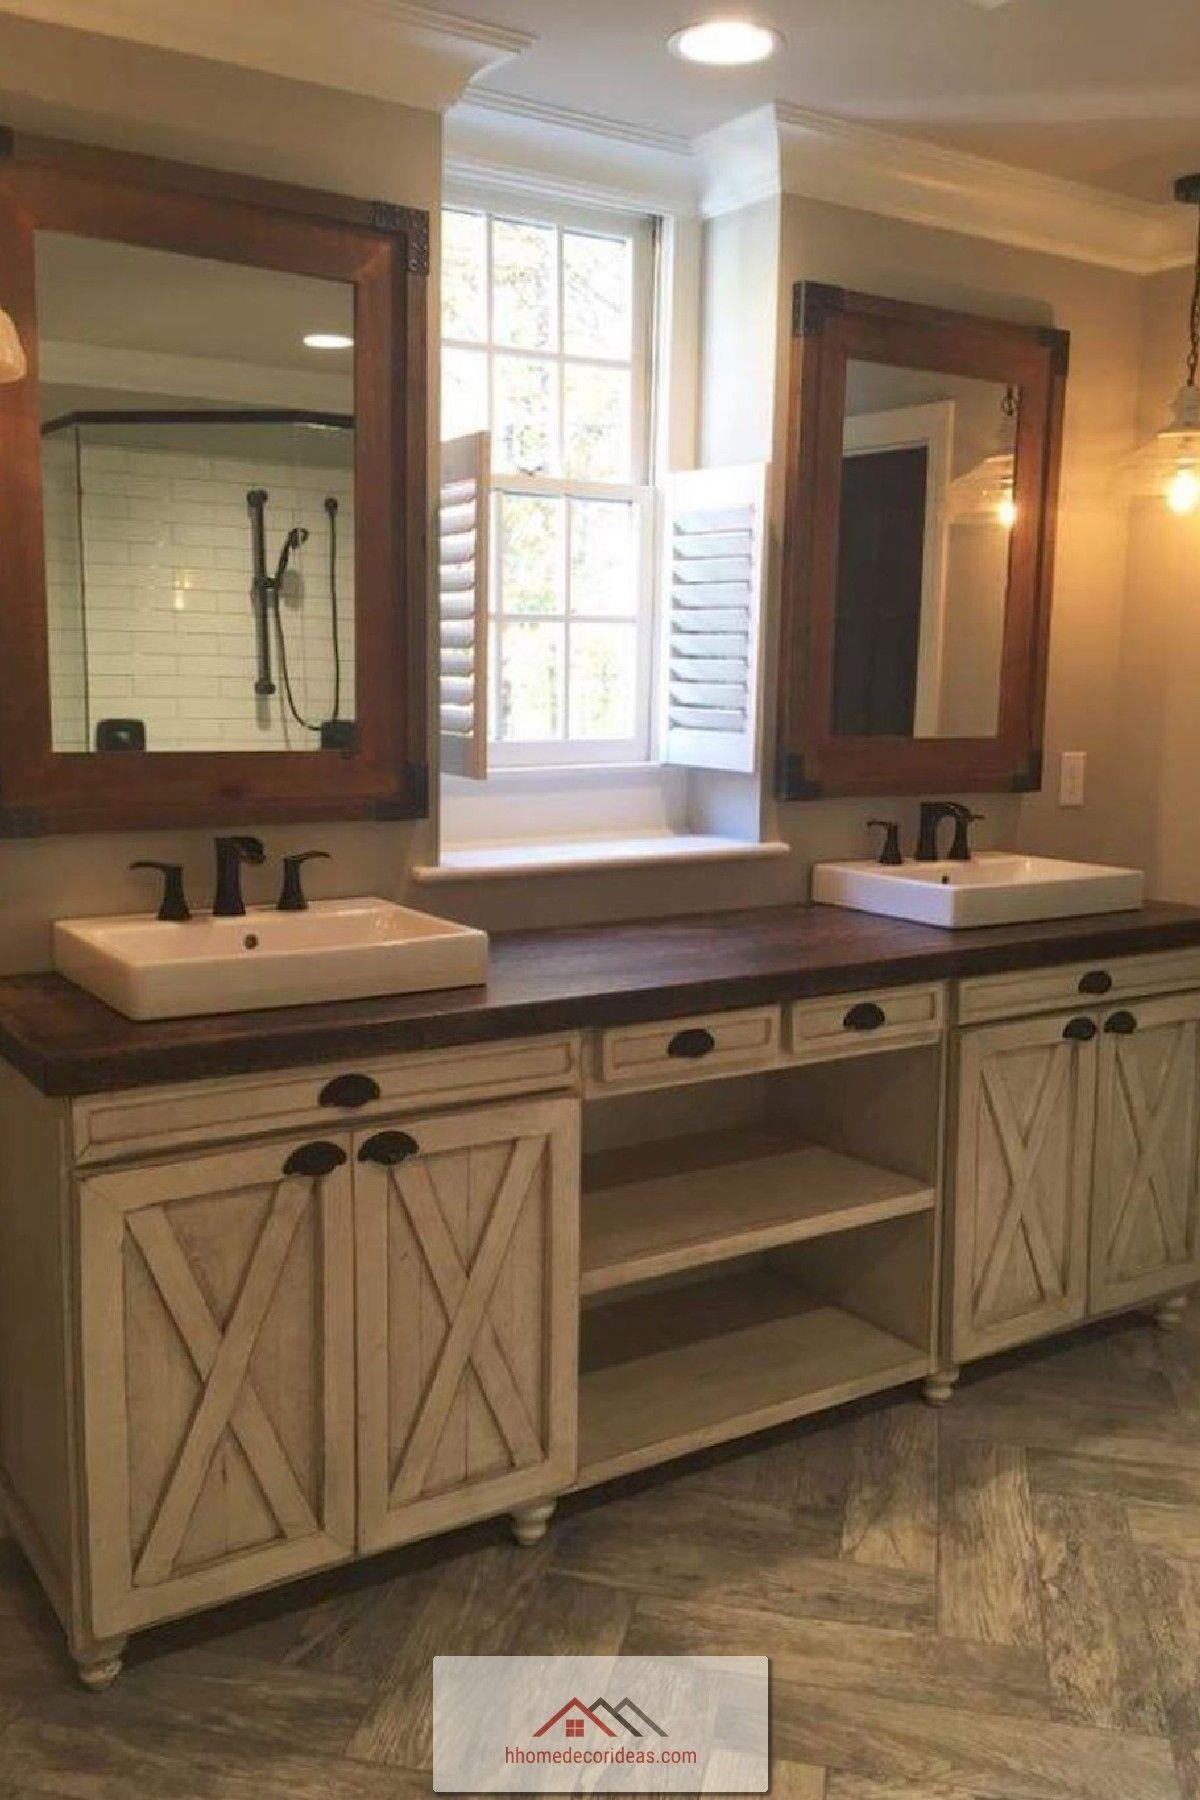 13 Rustic Farmhouse Master Bathroom Remodel Ideas Home Decor Bathroom Farmhouse Style Bathroom Remodel Master Rustic Bathroom Decor